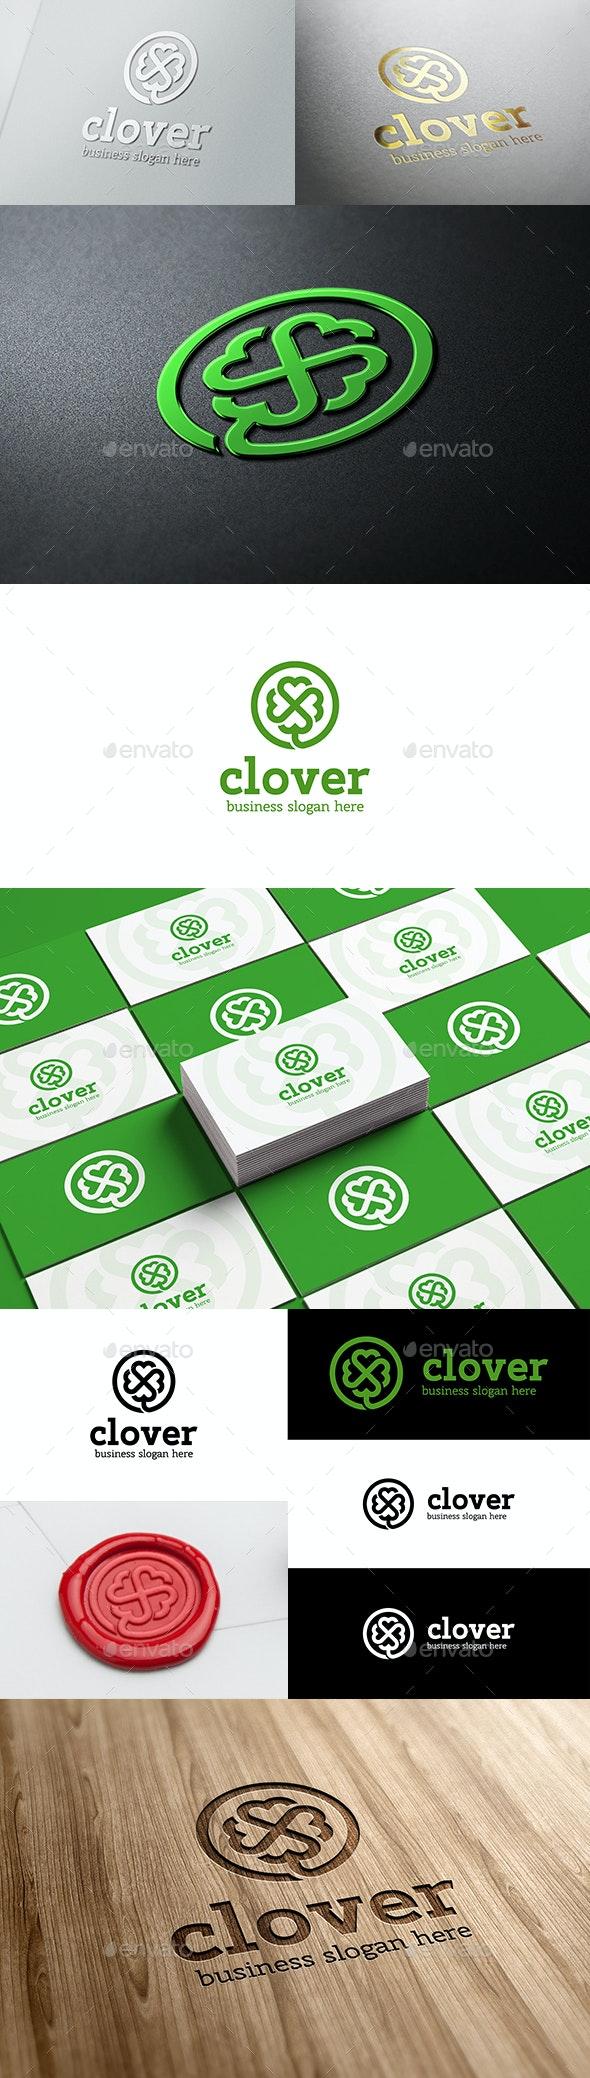 Clover Logo - Nature Logo Templates